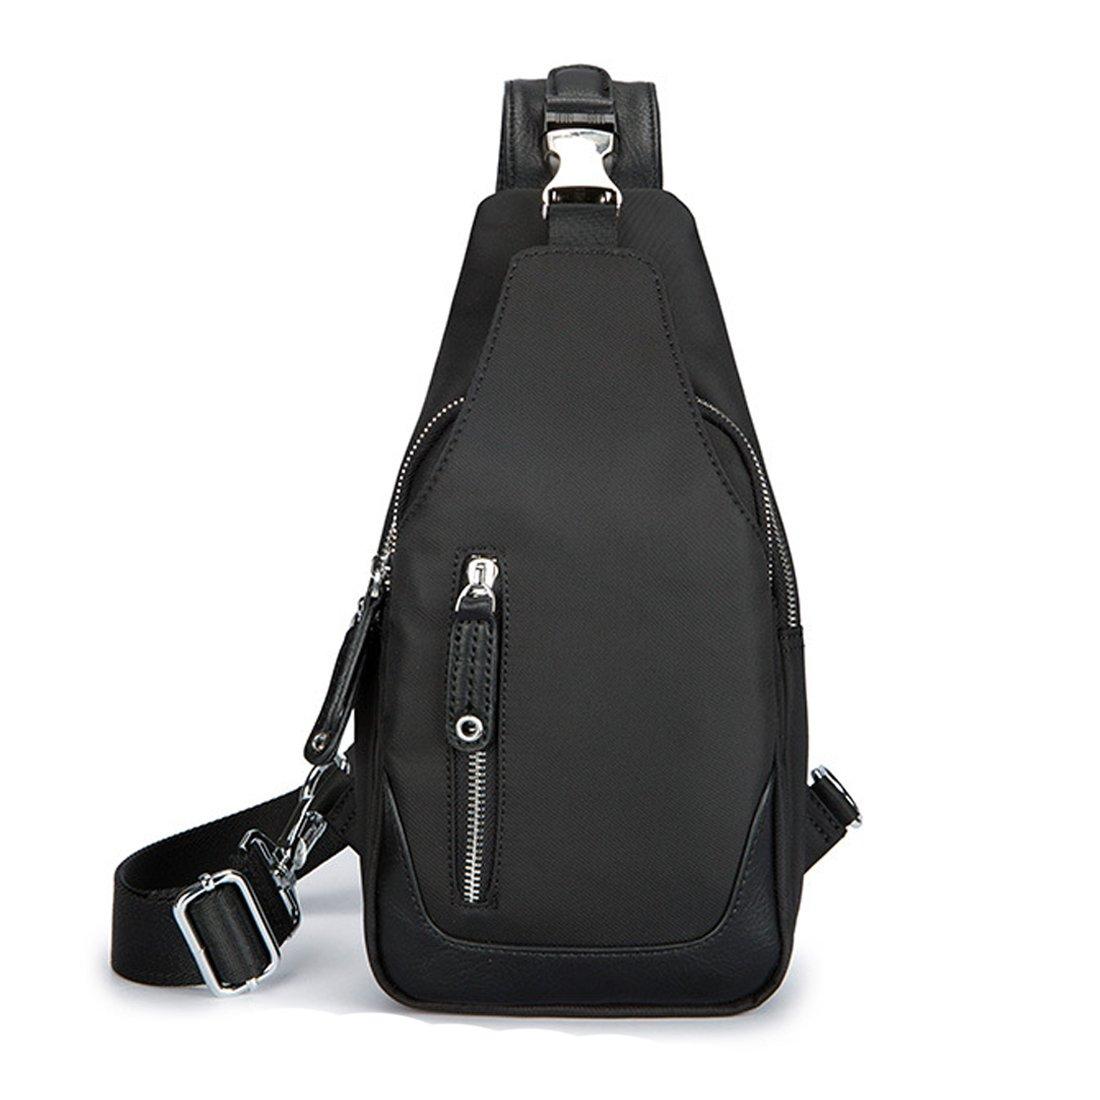 Aikosha Mens Sling Bag Fashion Waterproof Chest Bag For Hiking Travel Cycling Camping